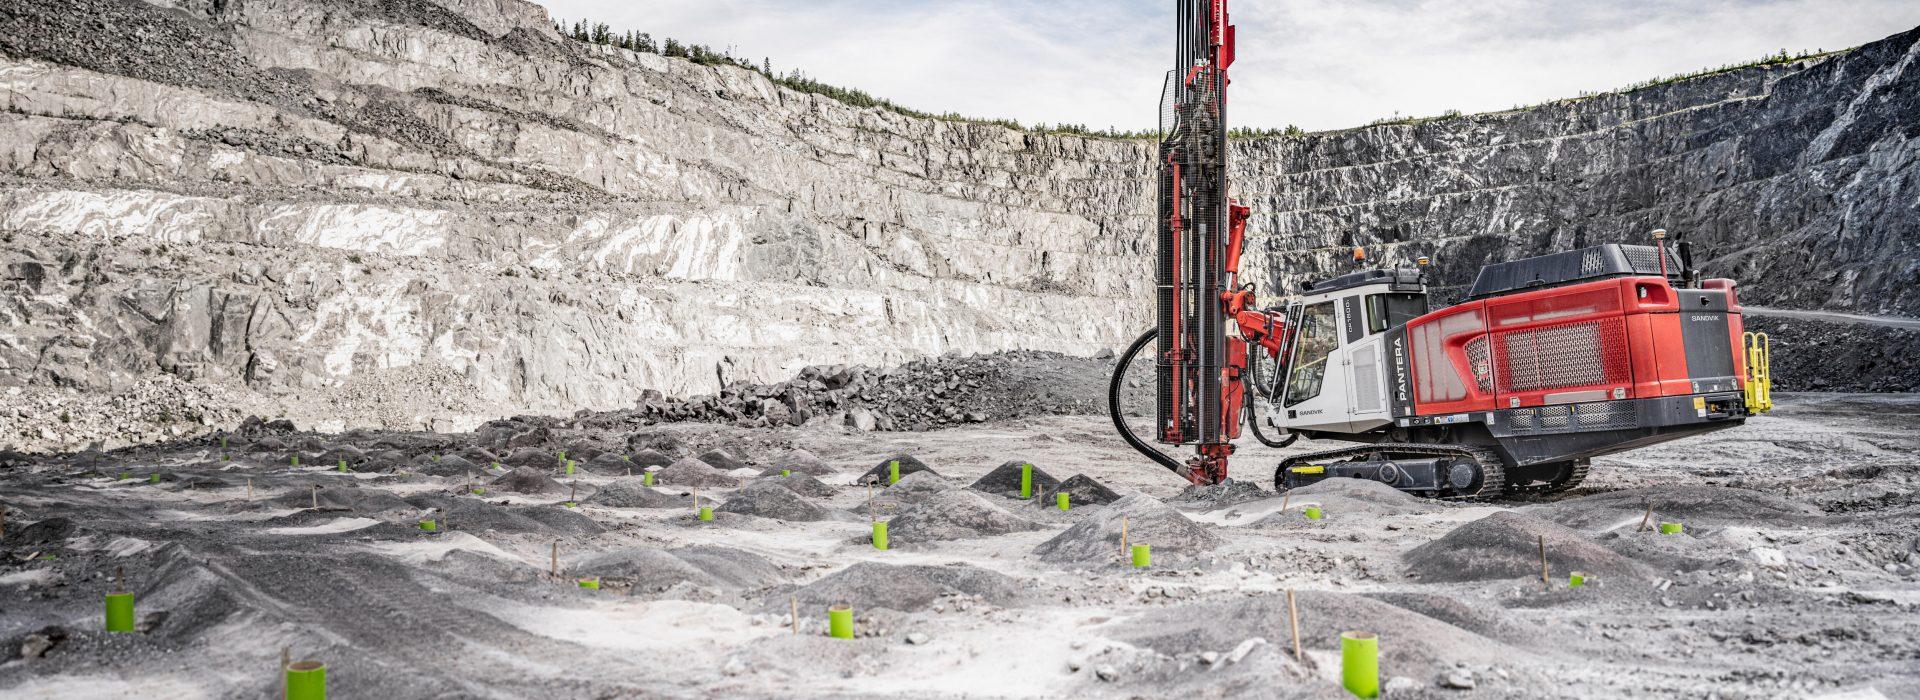 Bagger in einer Grube, Sandvik